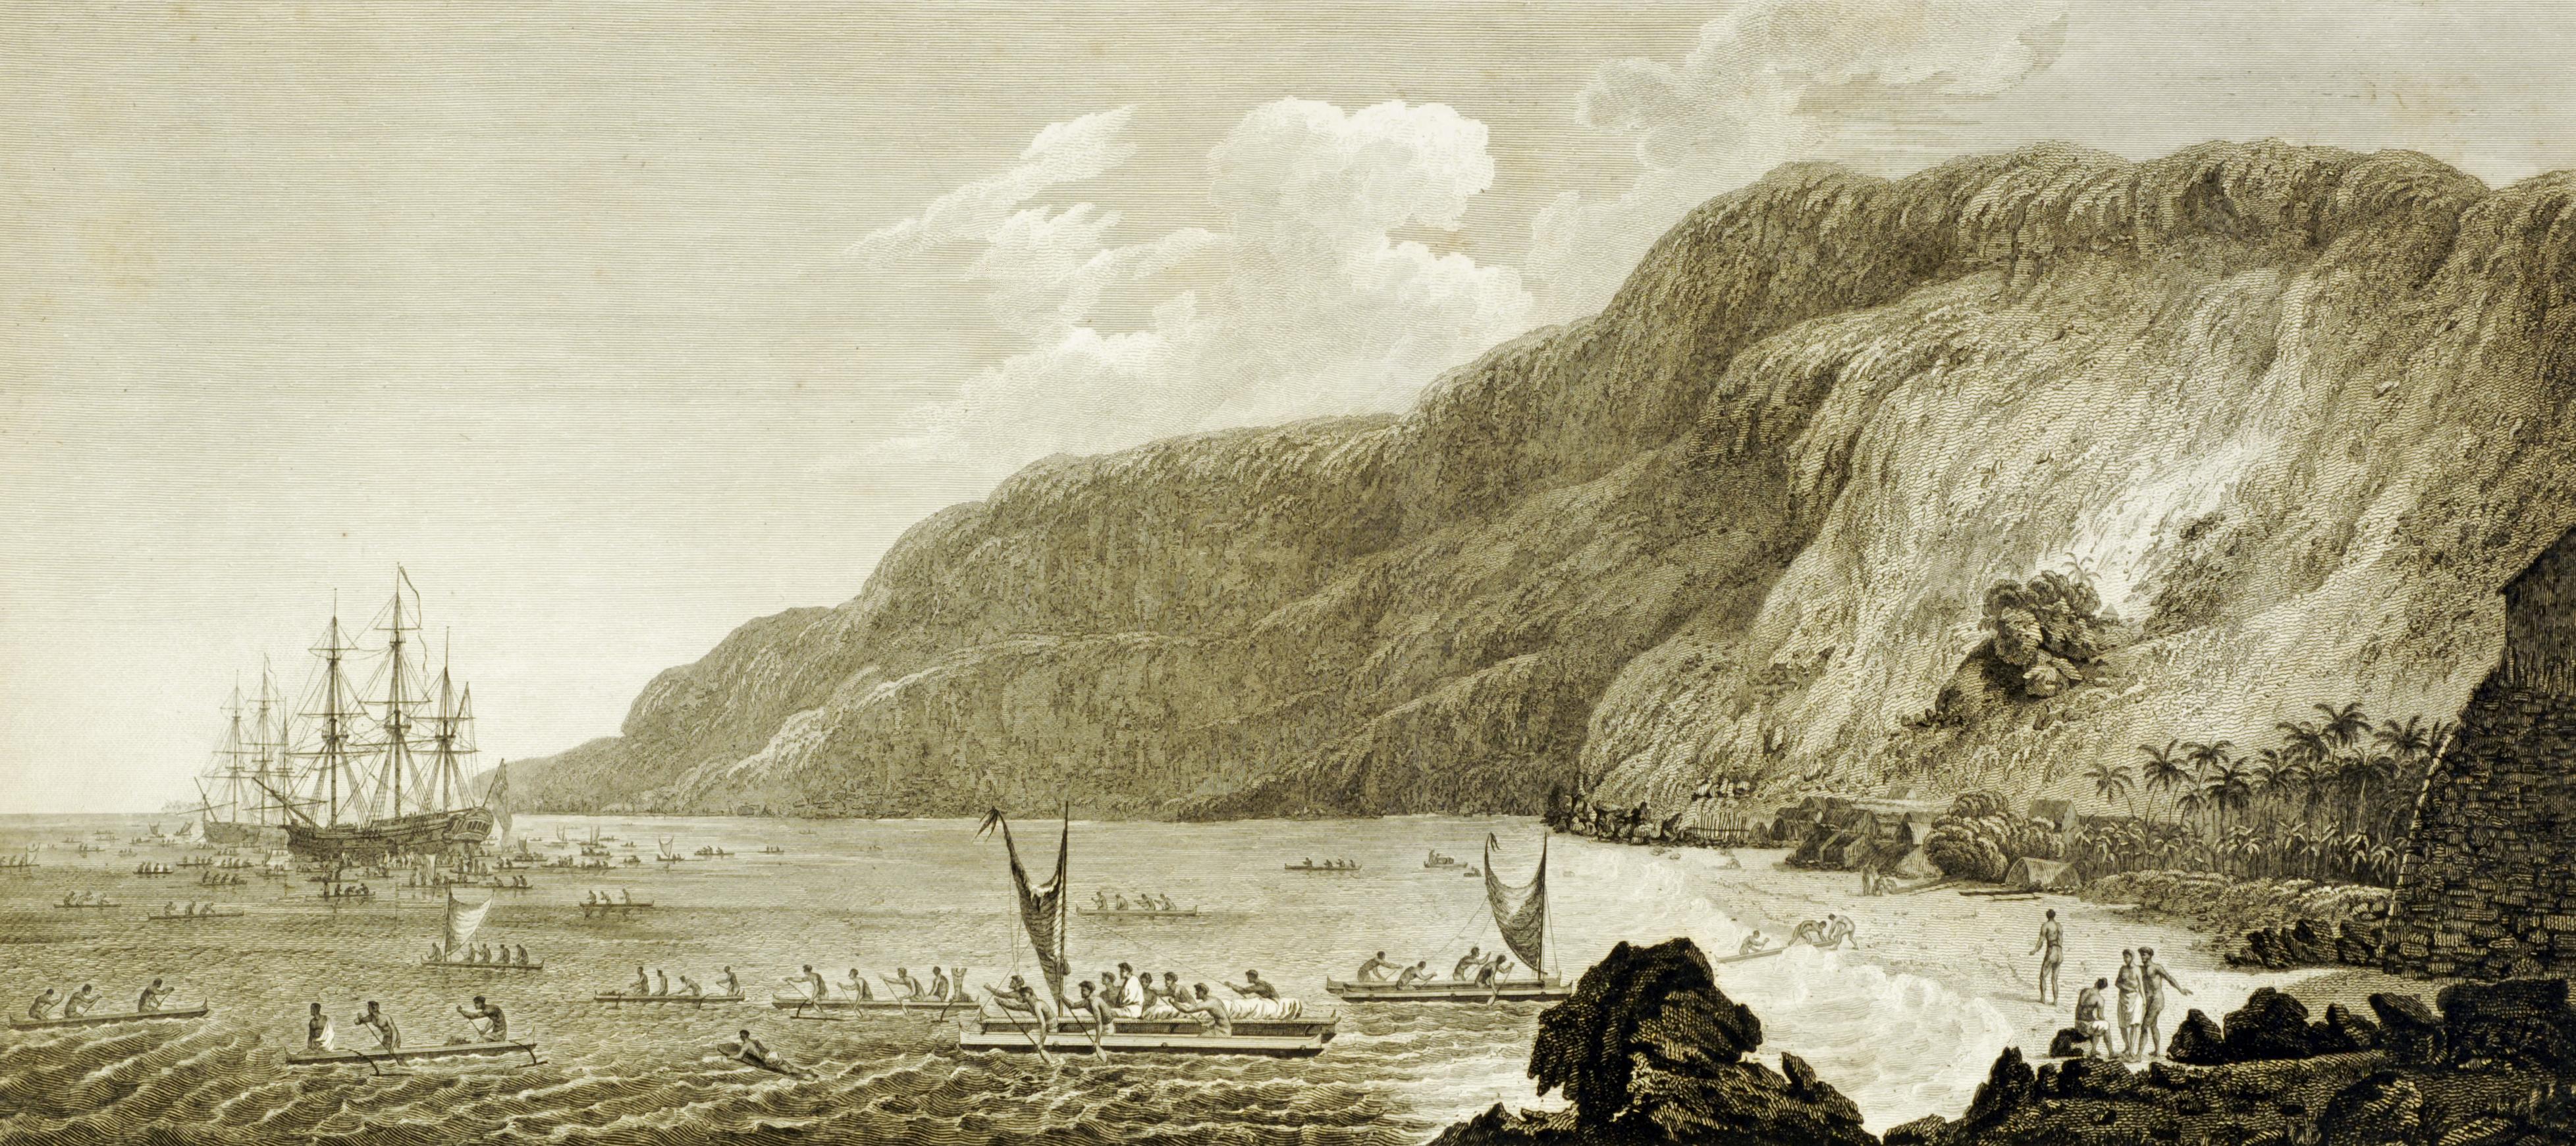 James Cook Third Voyage